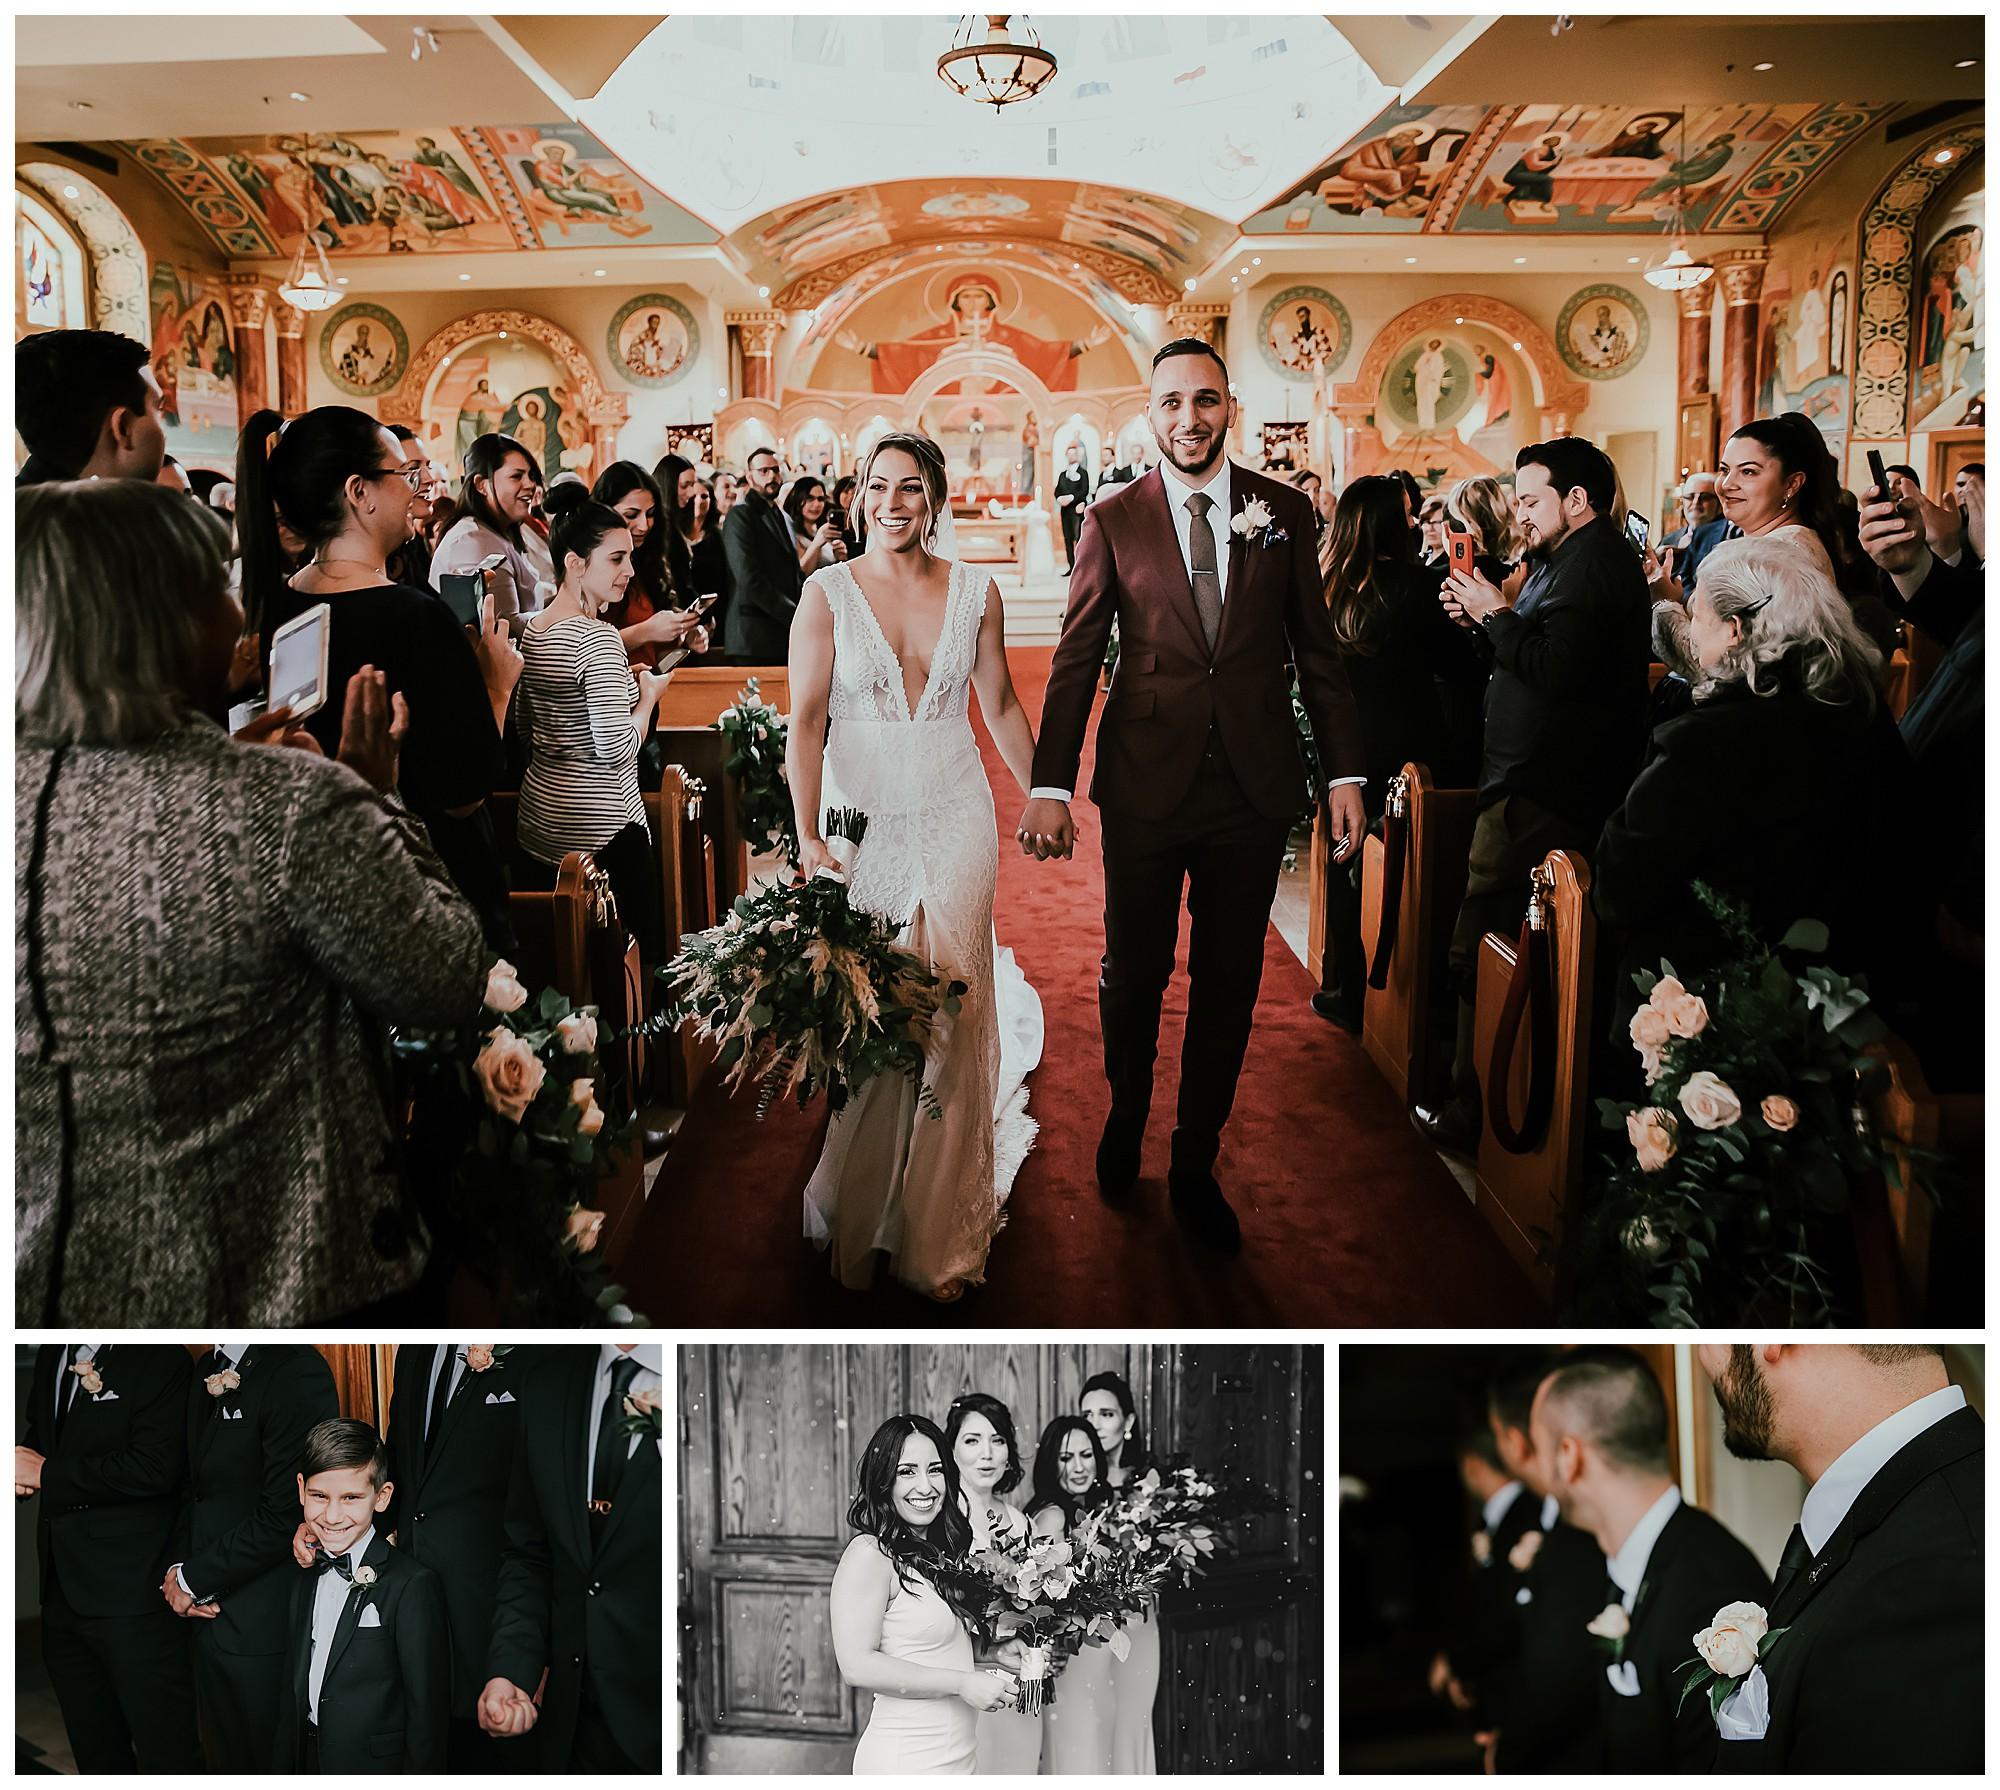 Joanna-Christos-Grand-Luxe-Wedding-Photos-Mint-Room-Toronto-VanDaele-Russell_0076.jpg